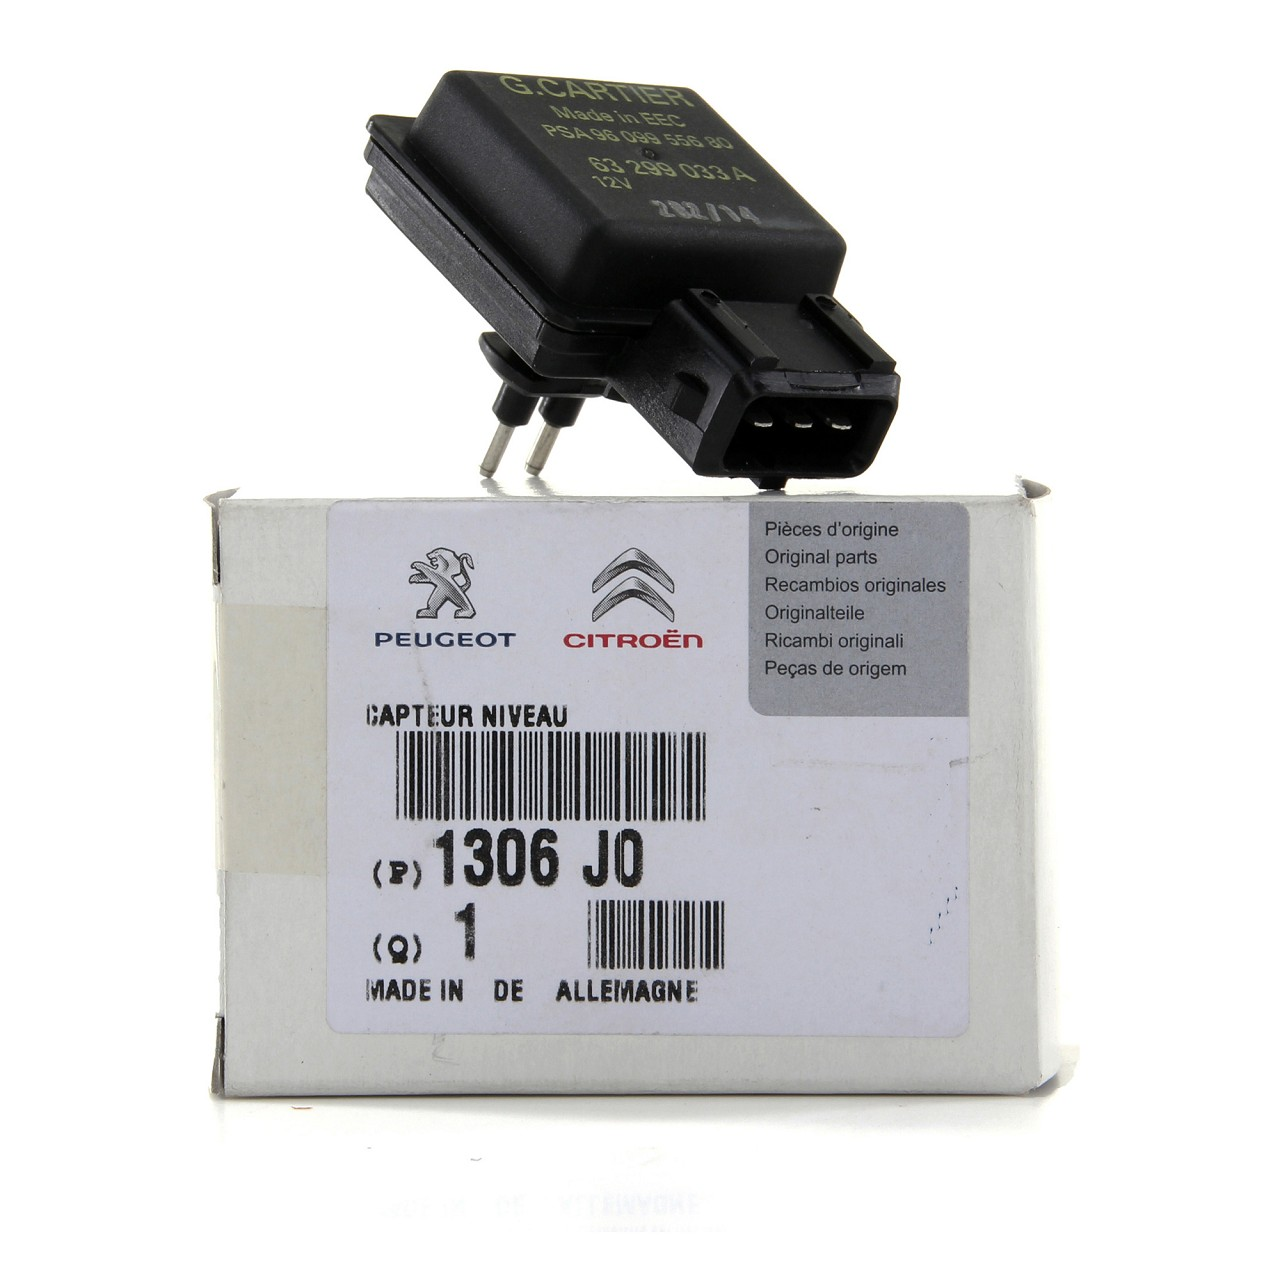 ORIGINAL PSA Kühlmittelstandssensor Berlingo C3 3008 306 405 5008 607 1306.J0